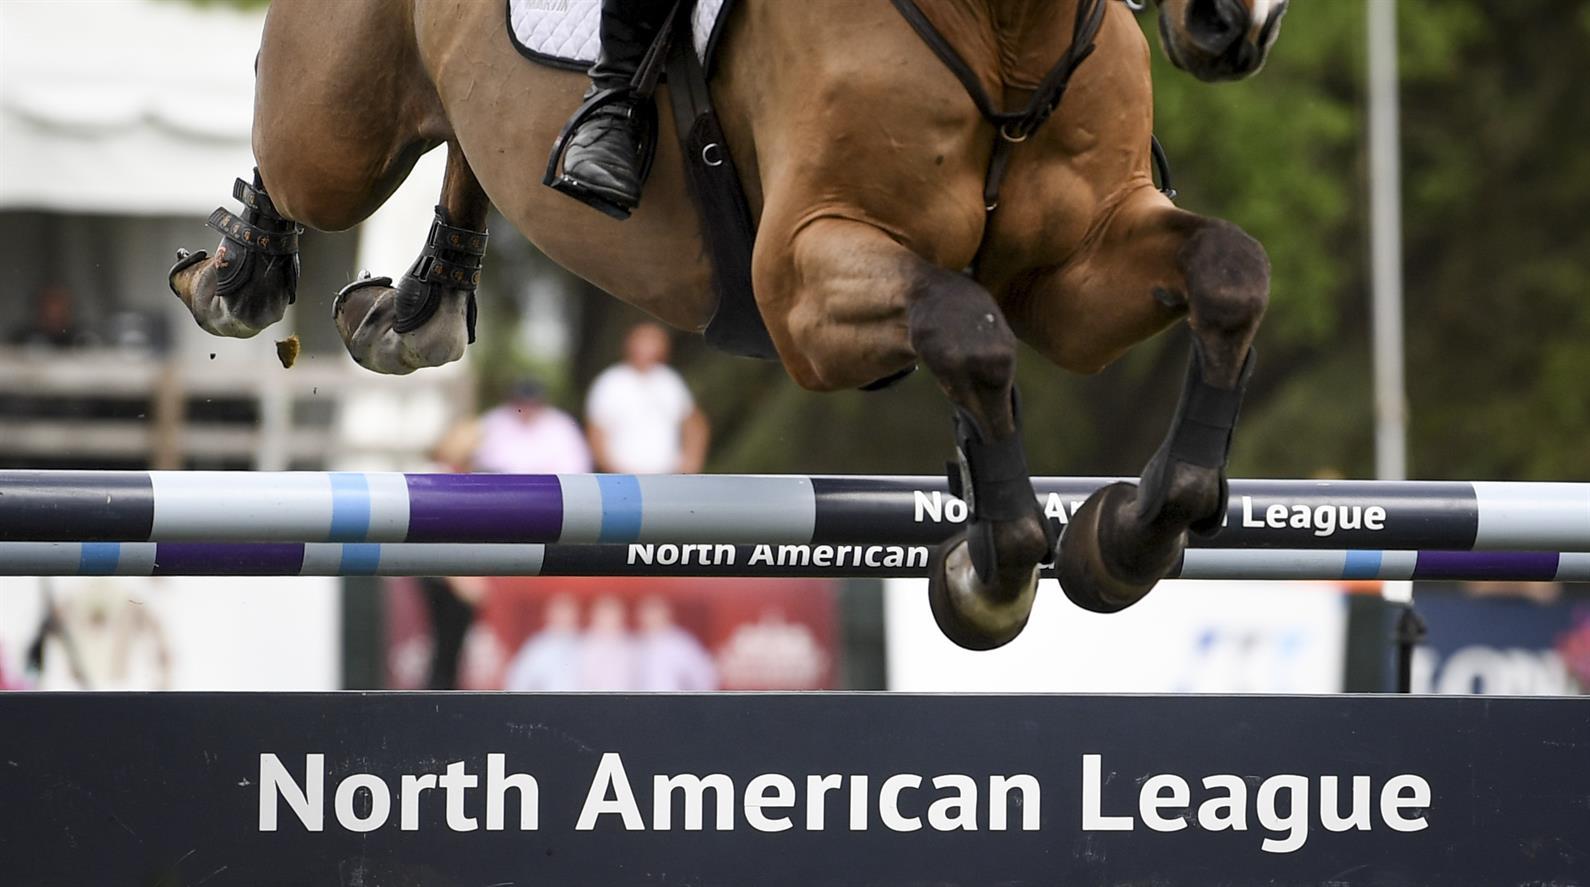 Photo: Andrea Evans/US Equestrian